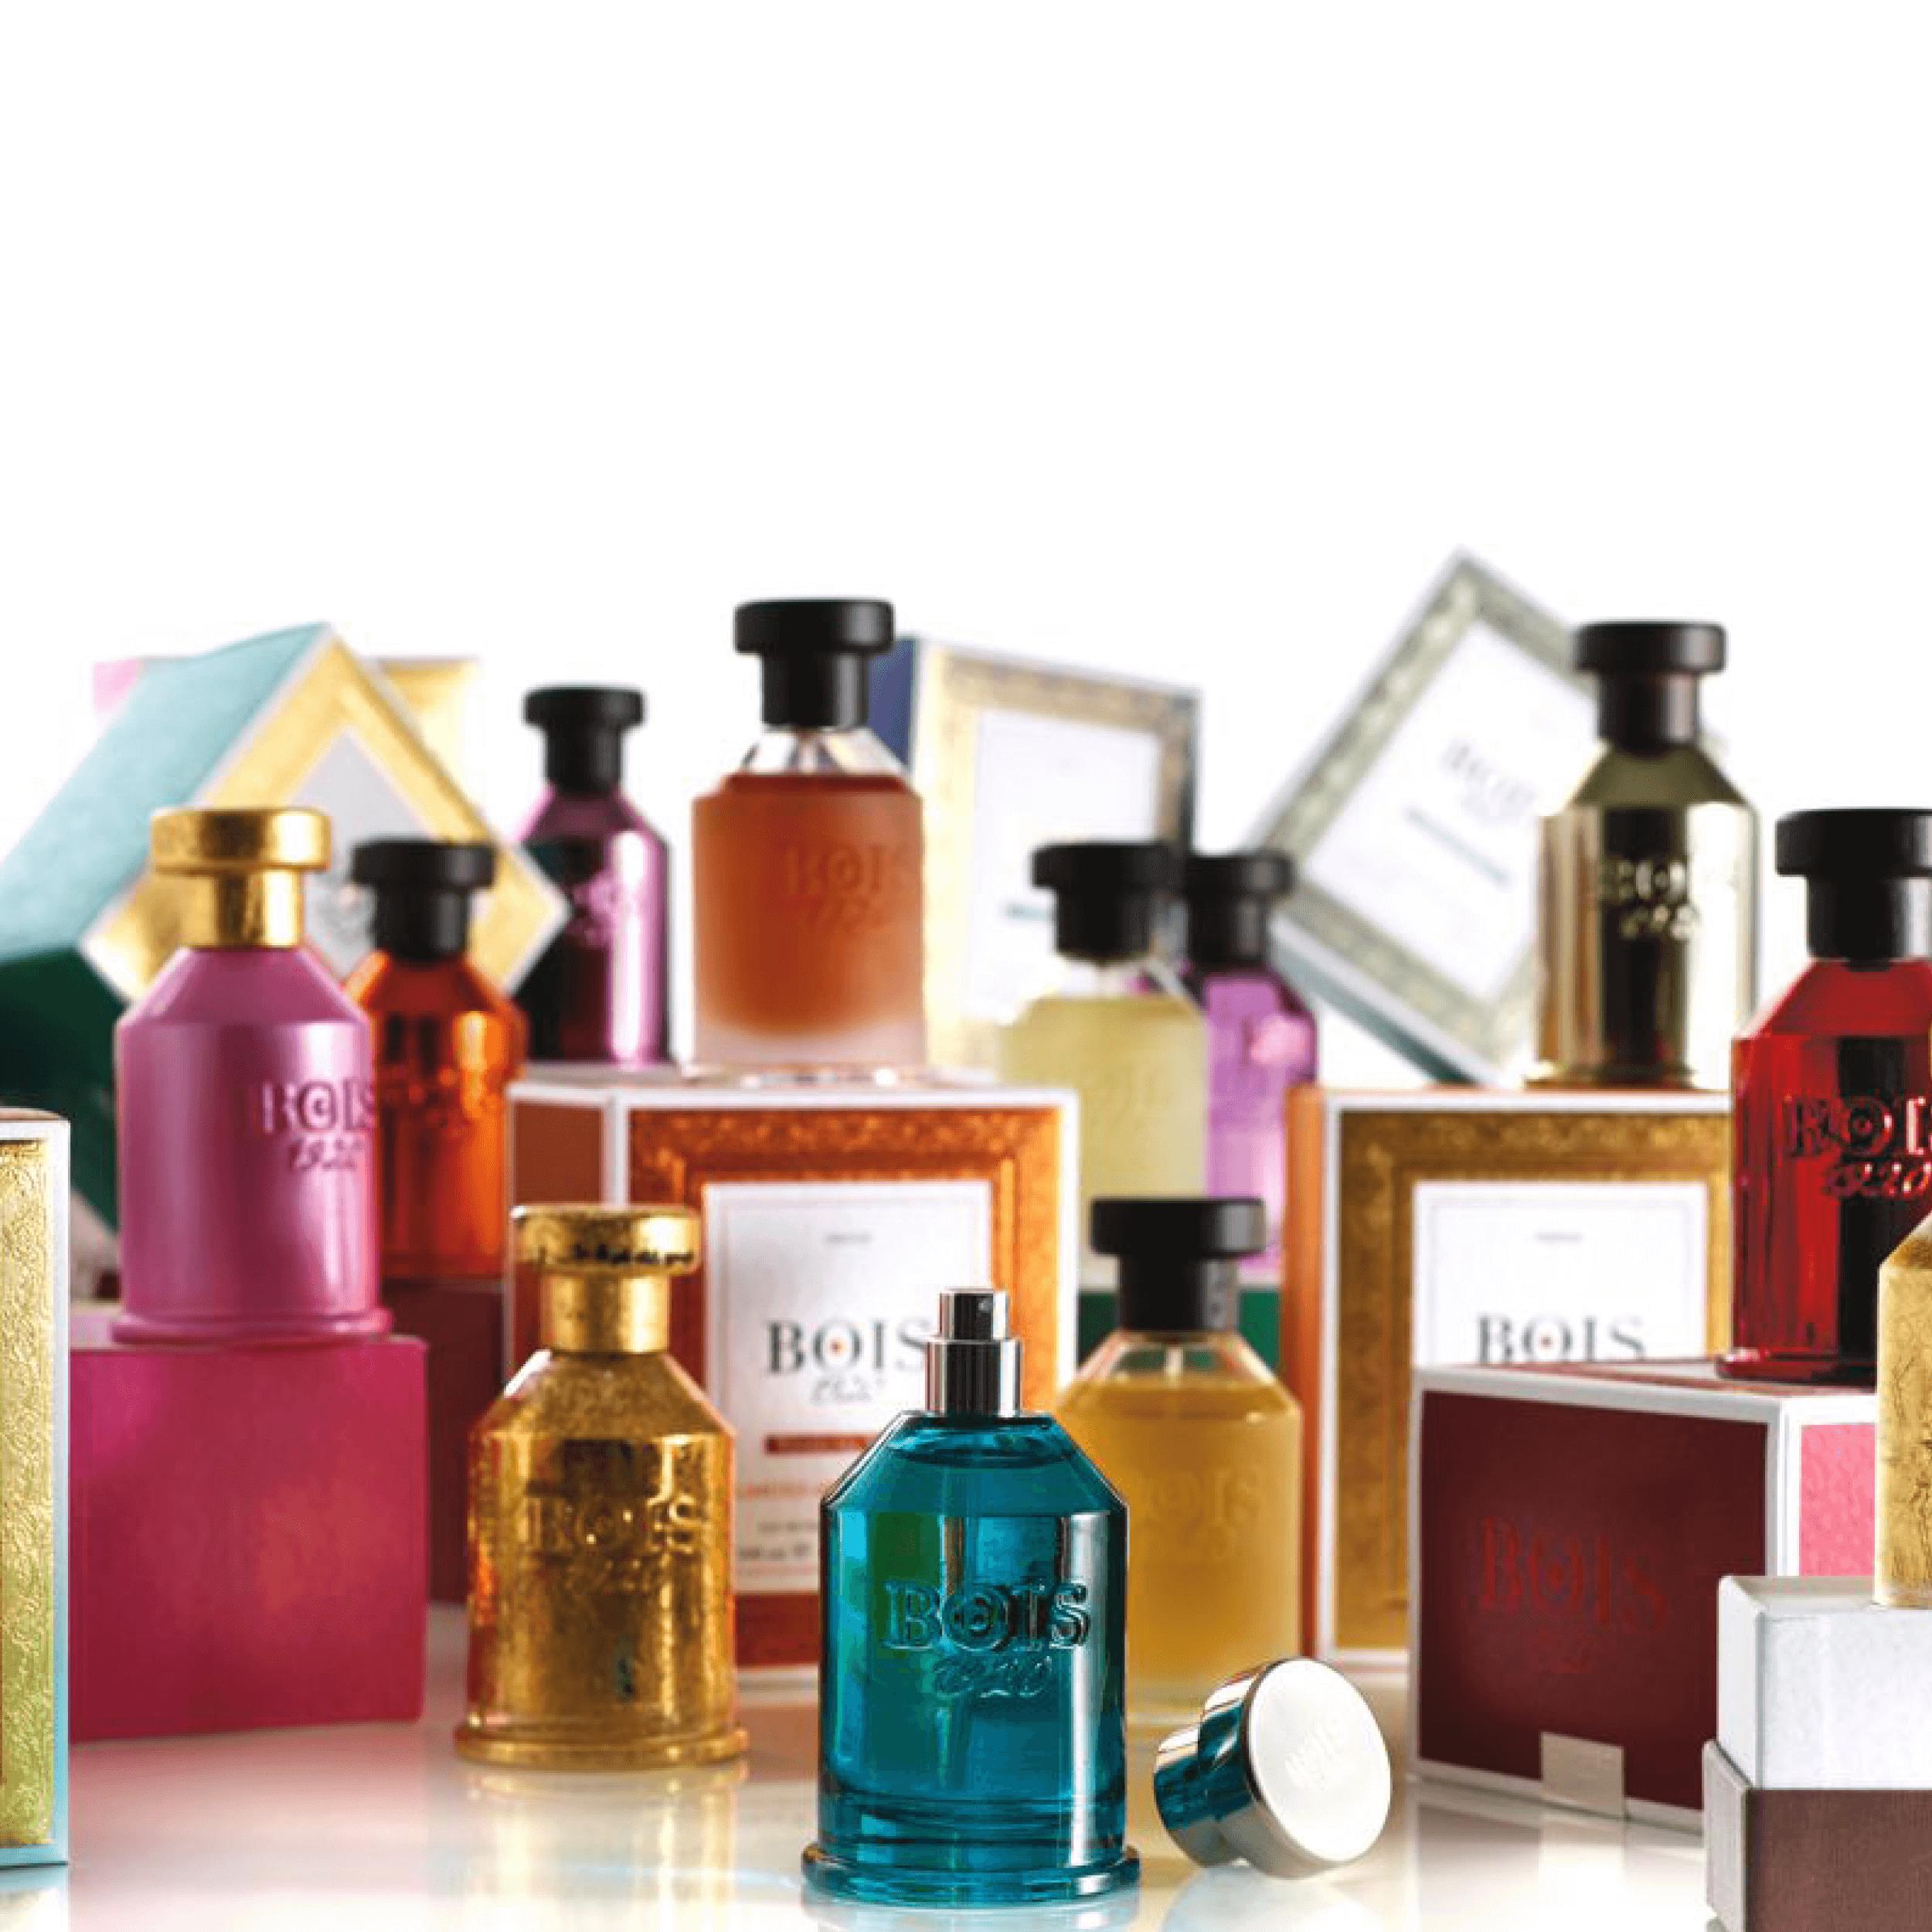 BOIS parfum bestellen